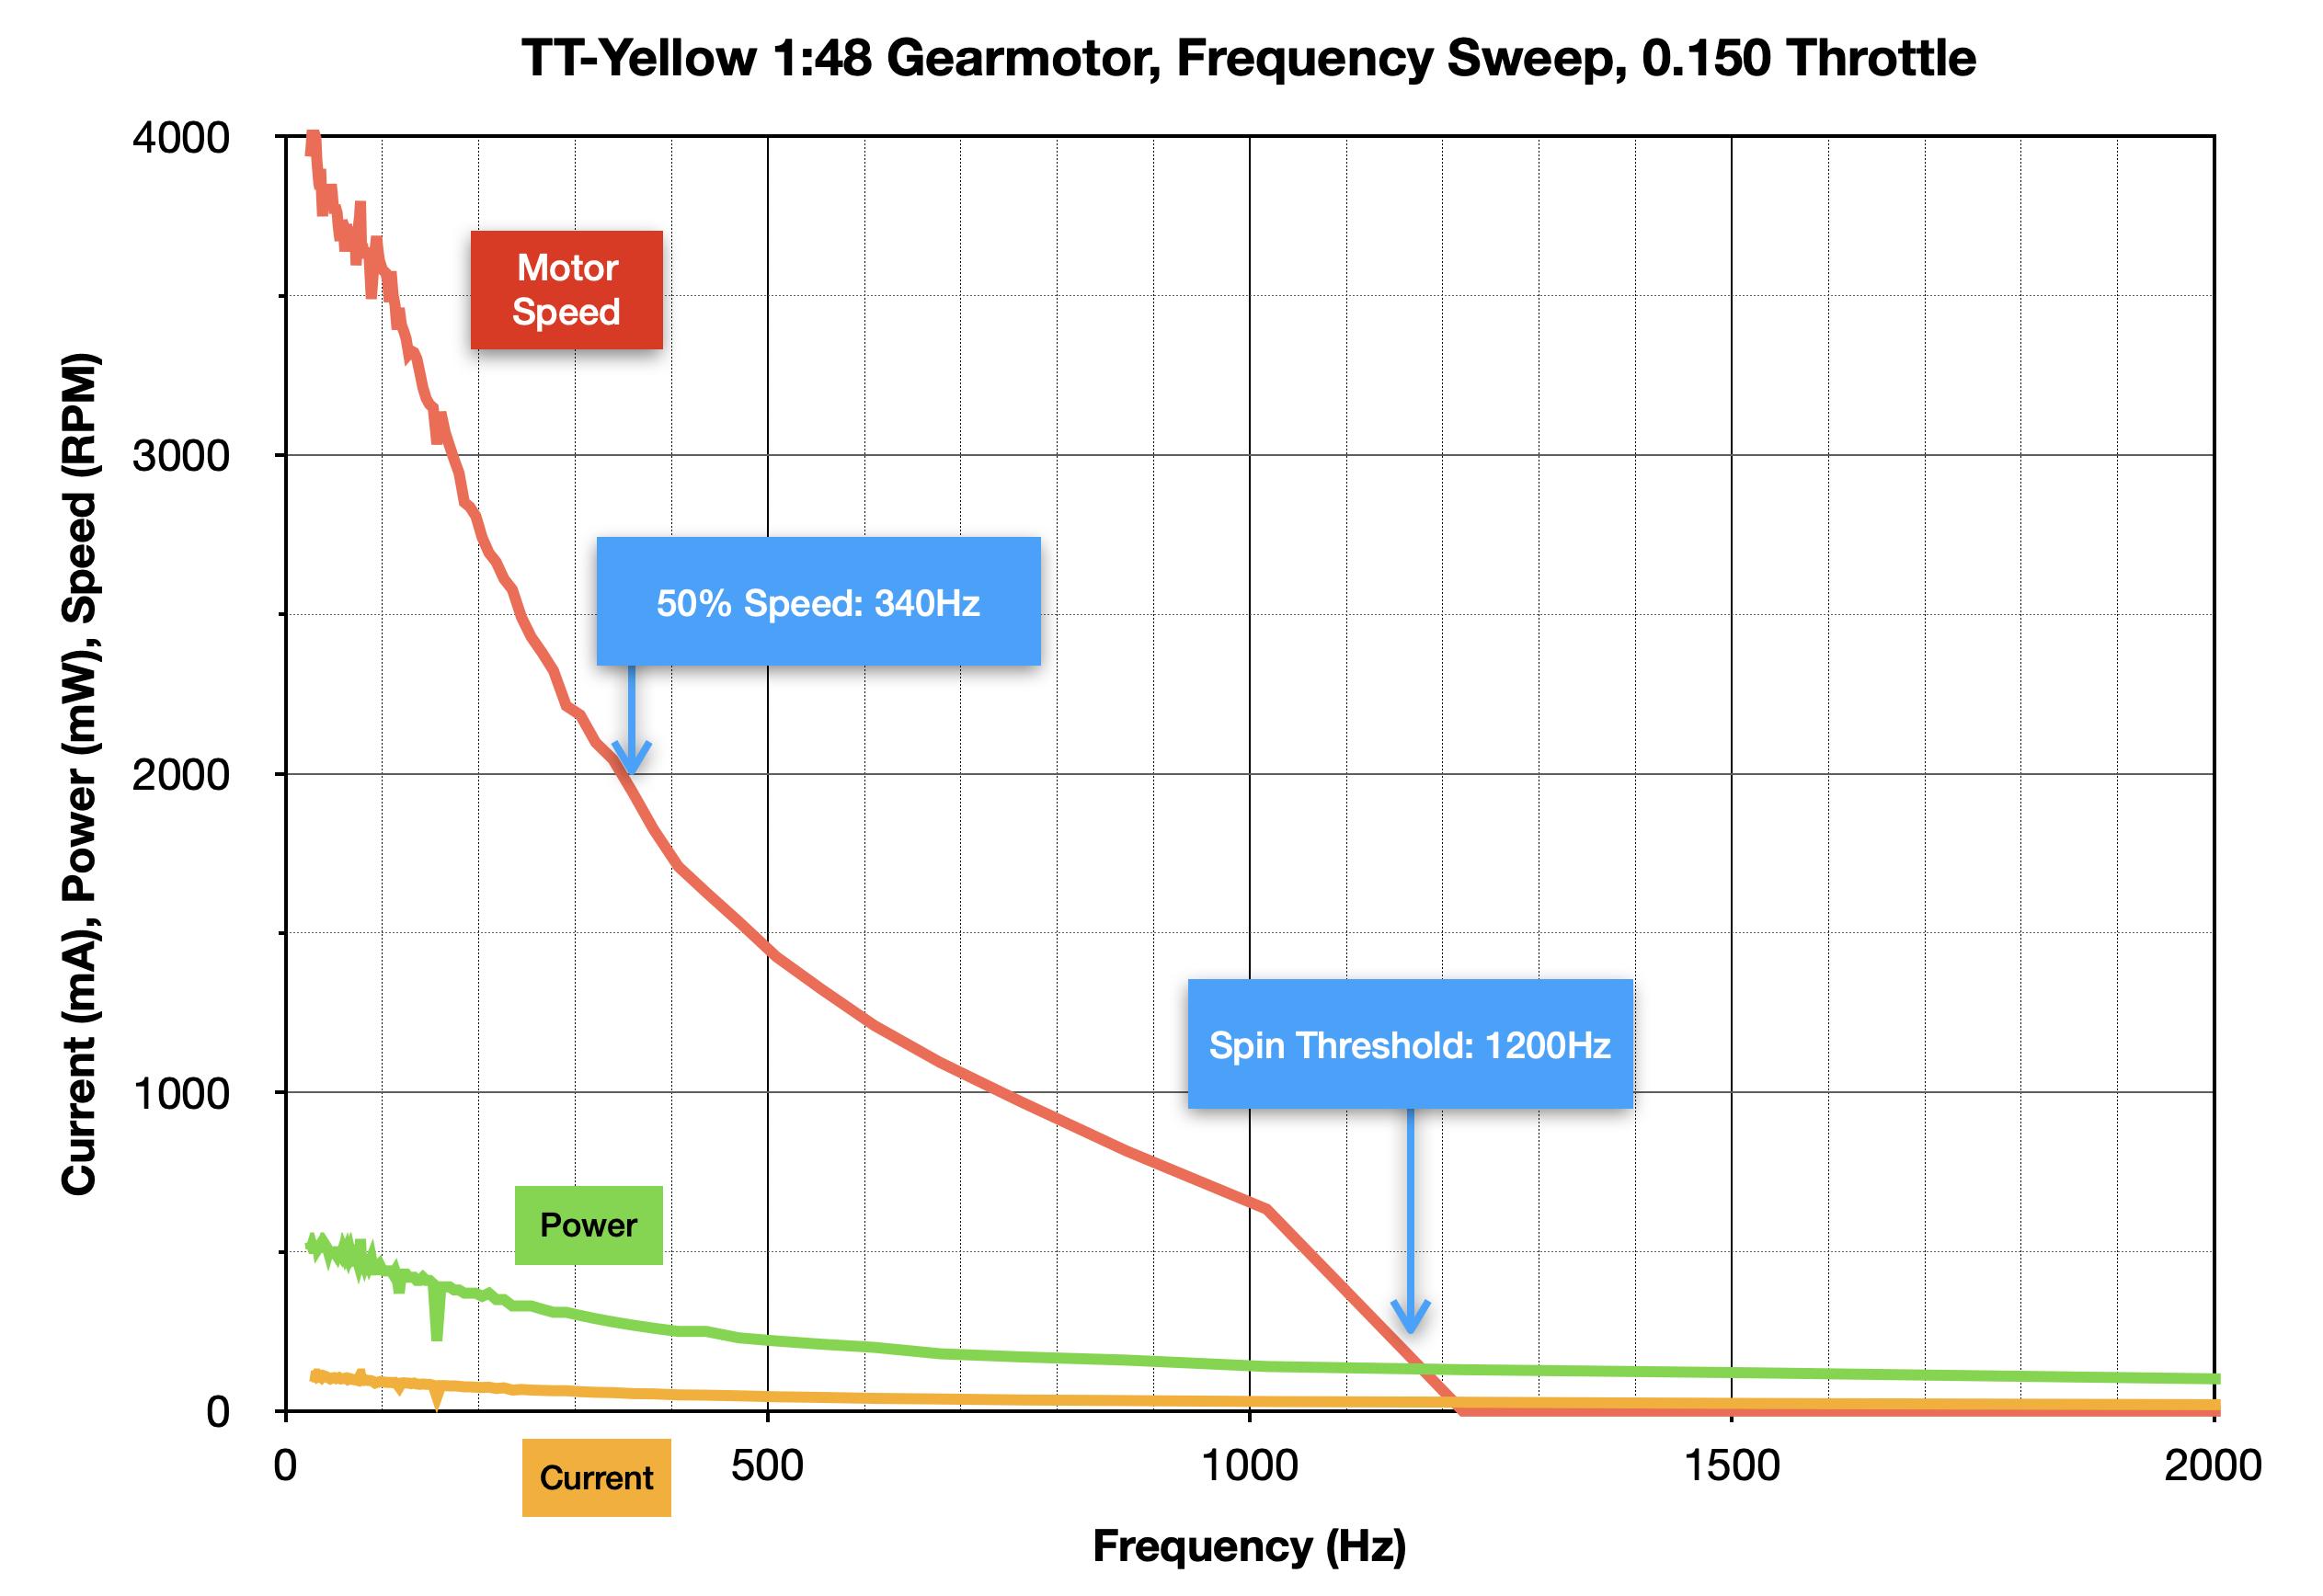 robotics___cnc_TT-Yellow_Frequency_Response.png